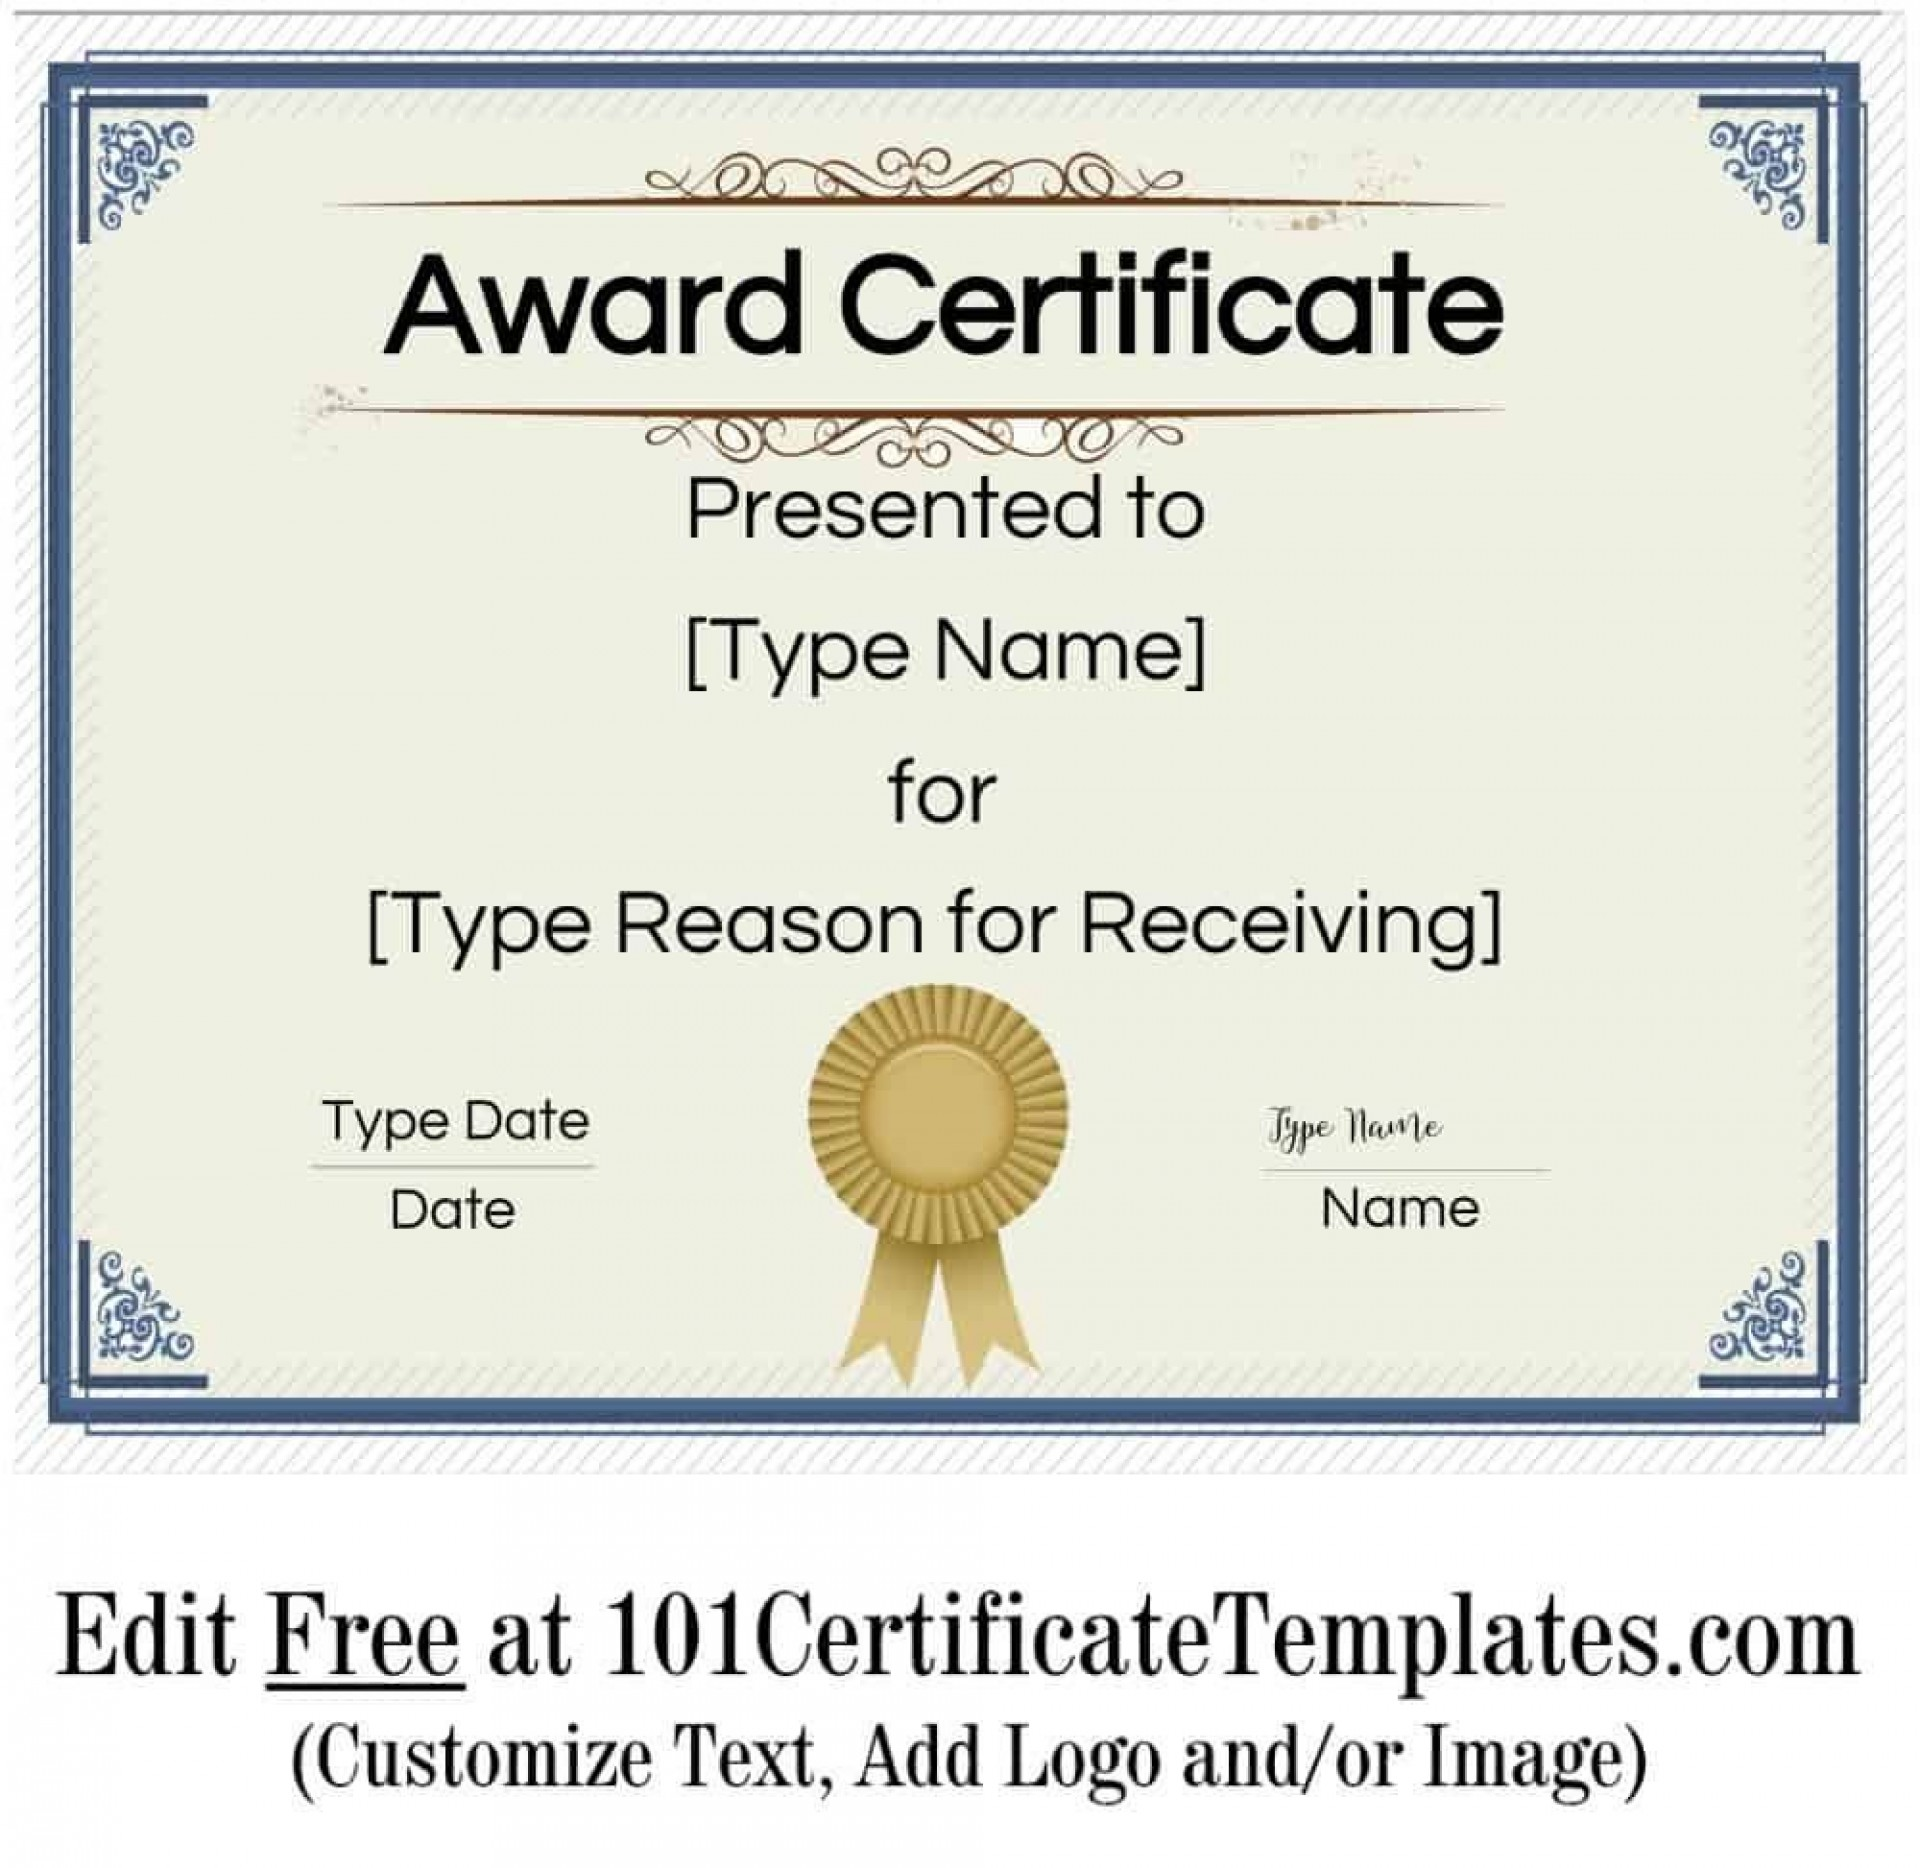 006 Top Blank Award Certificate Template Image  Printable Math Editable Free1920